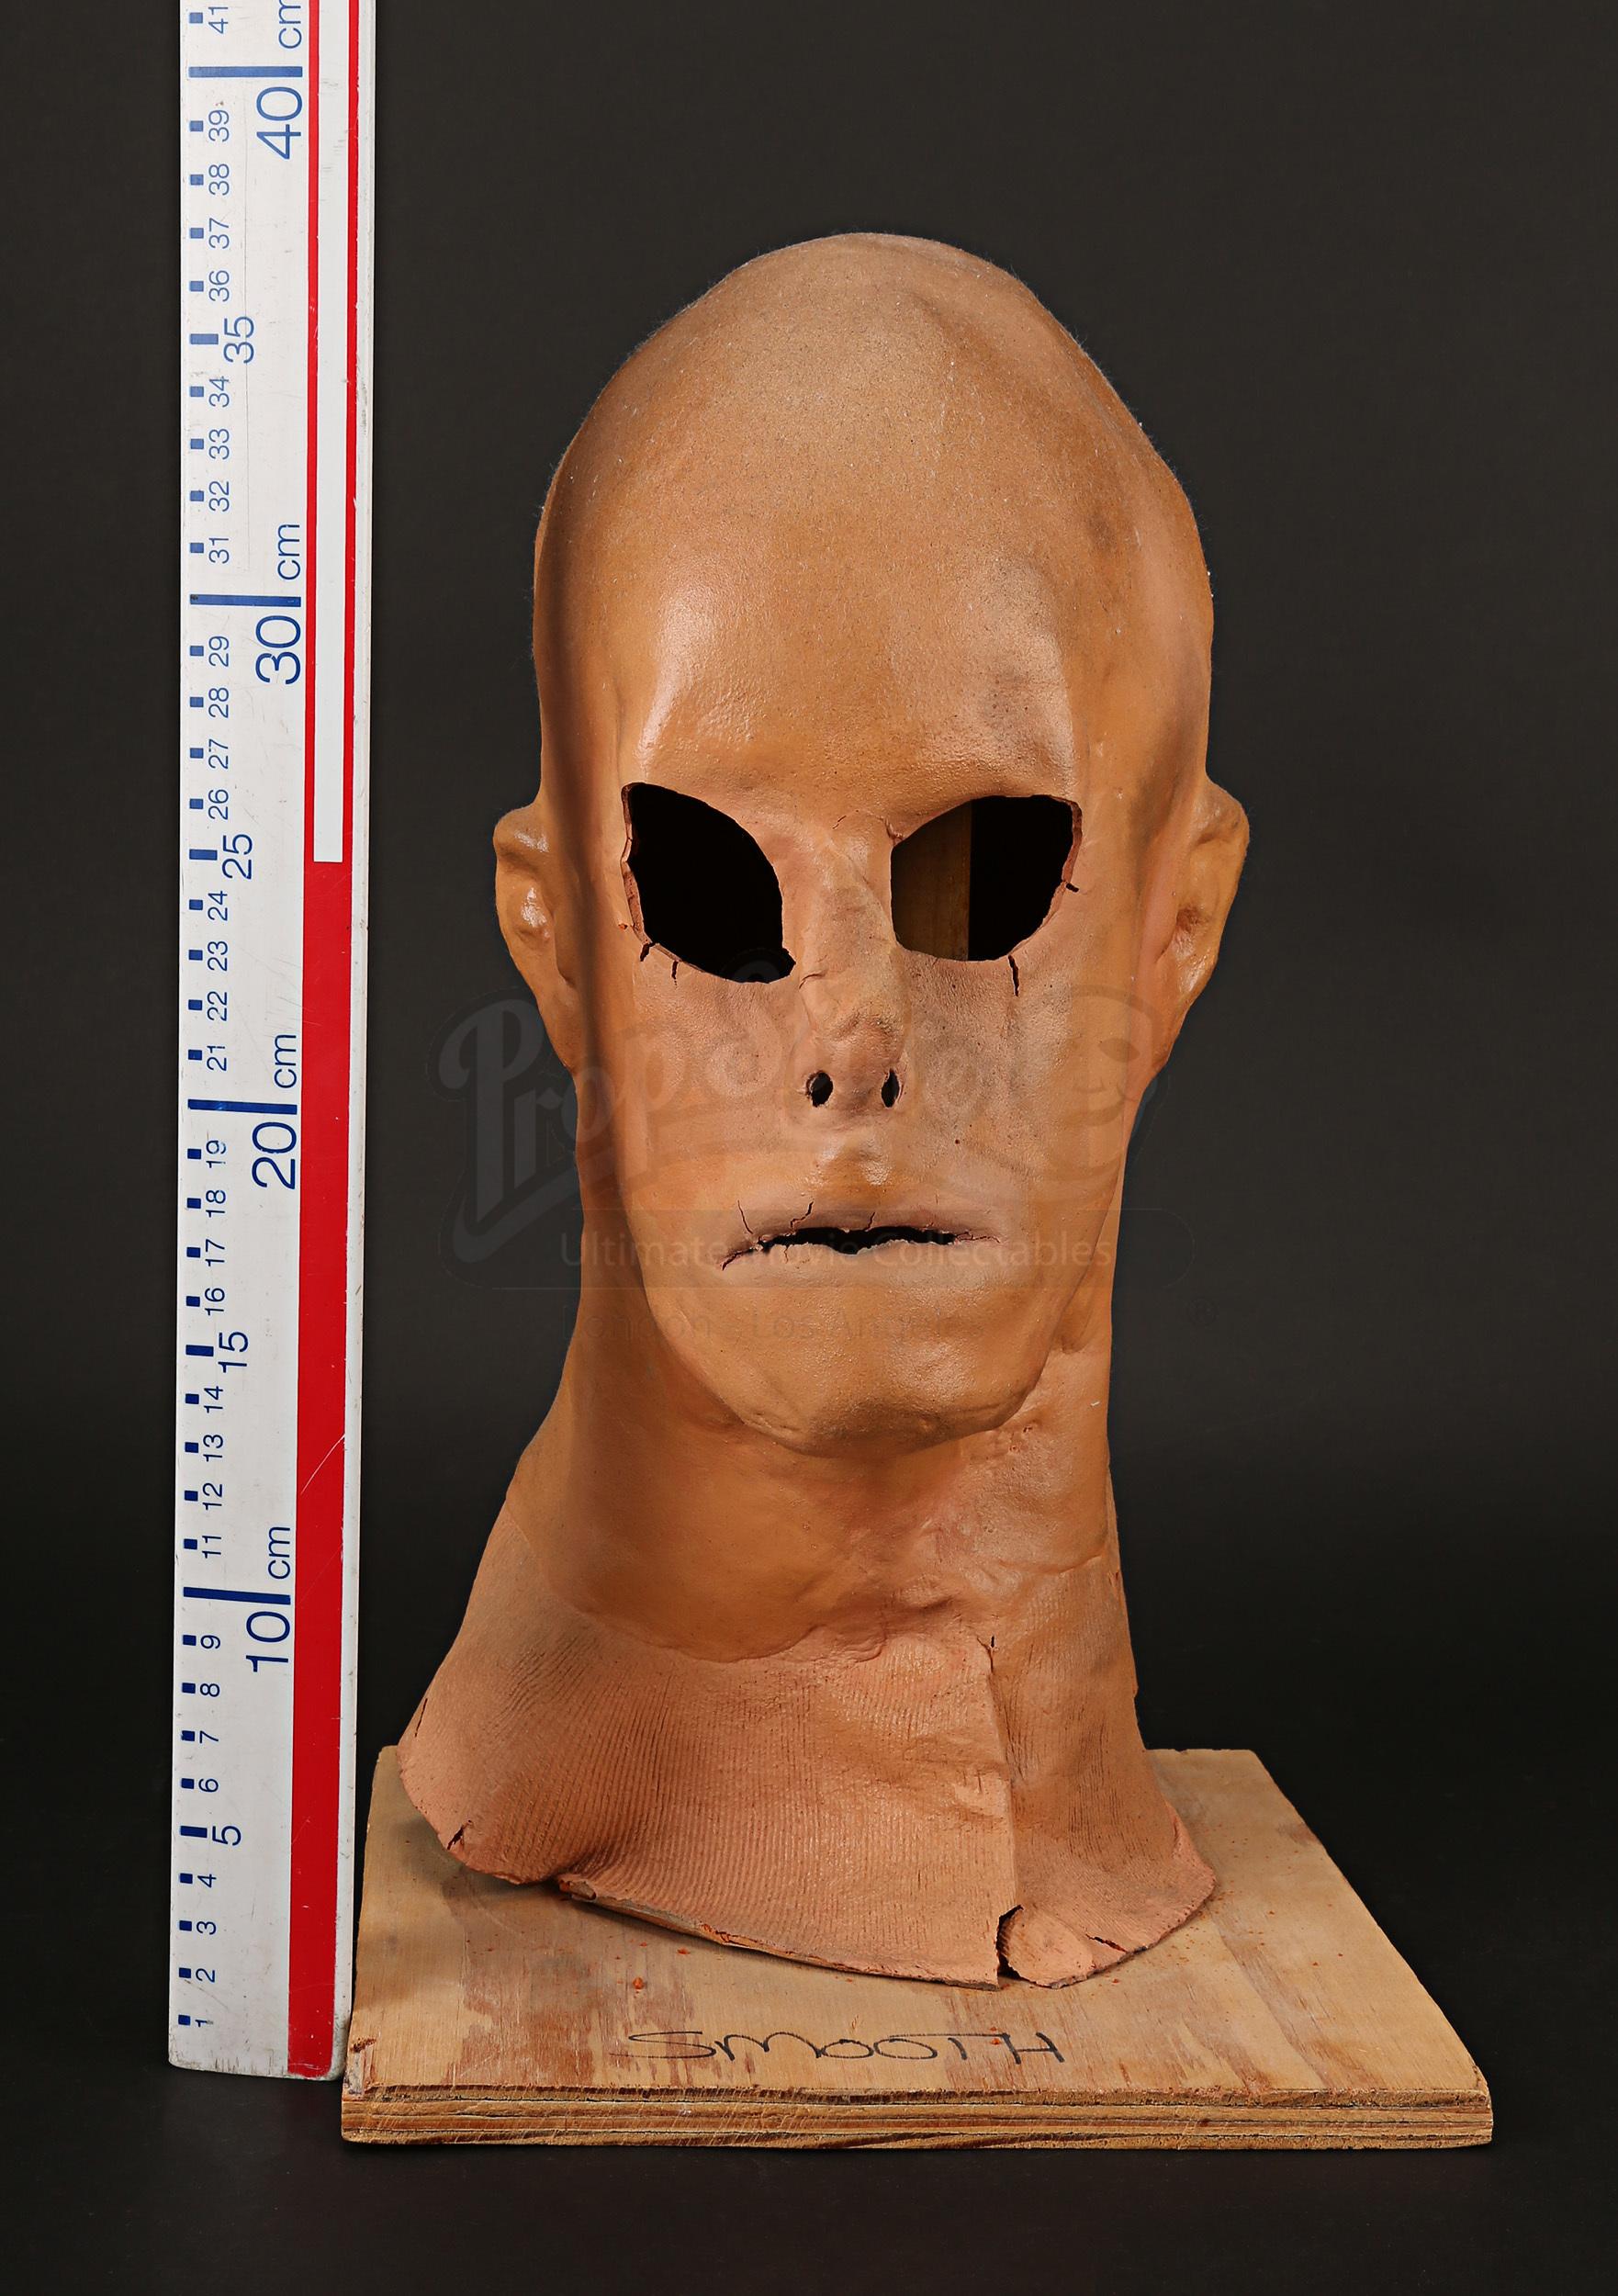 Sebastian Caines (Kevin Bacon) Face Mask